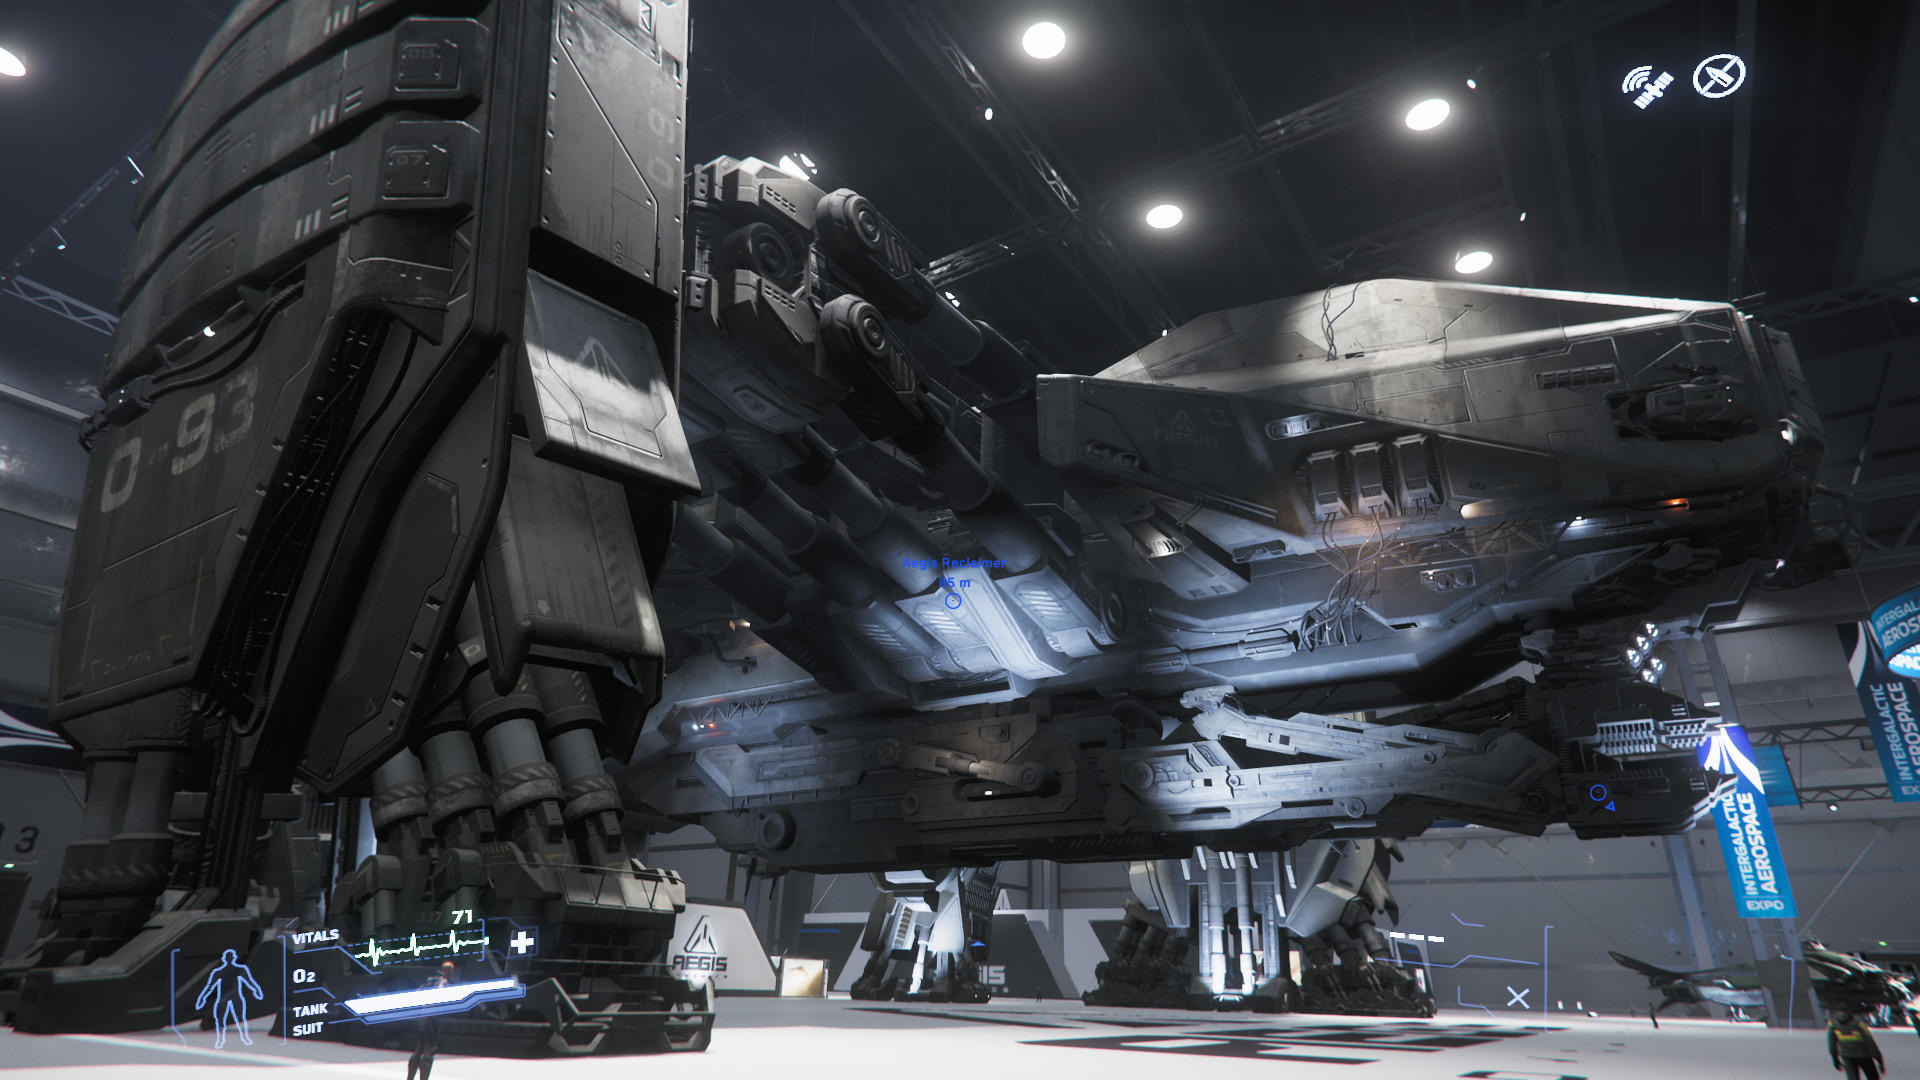 Intergalactic Aerospace Expo 2948 - Reclaimer